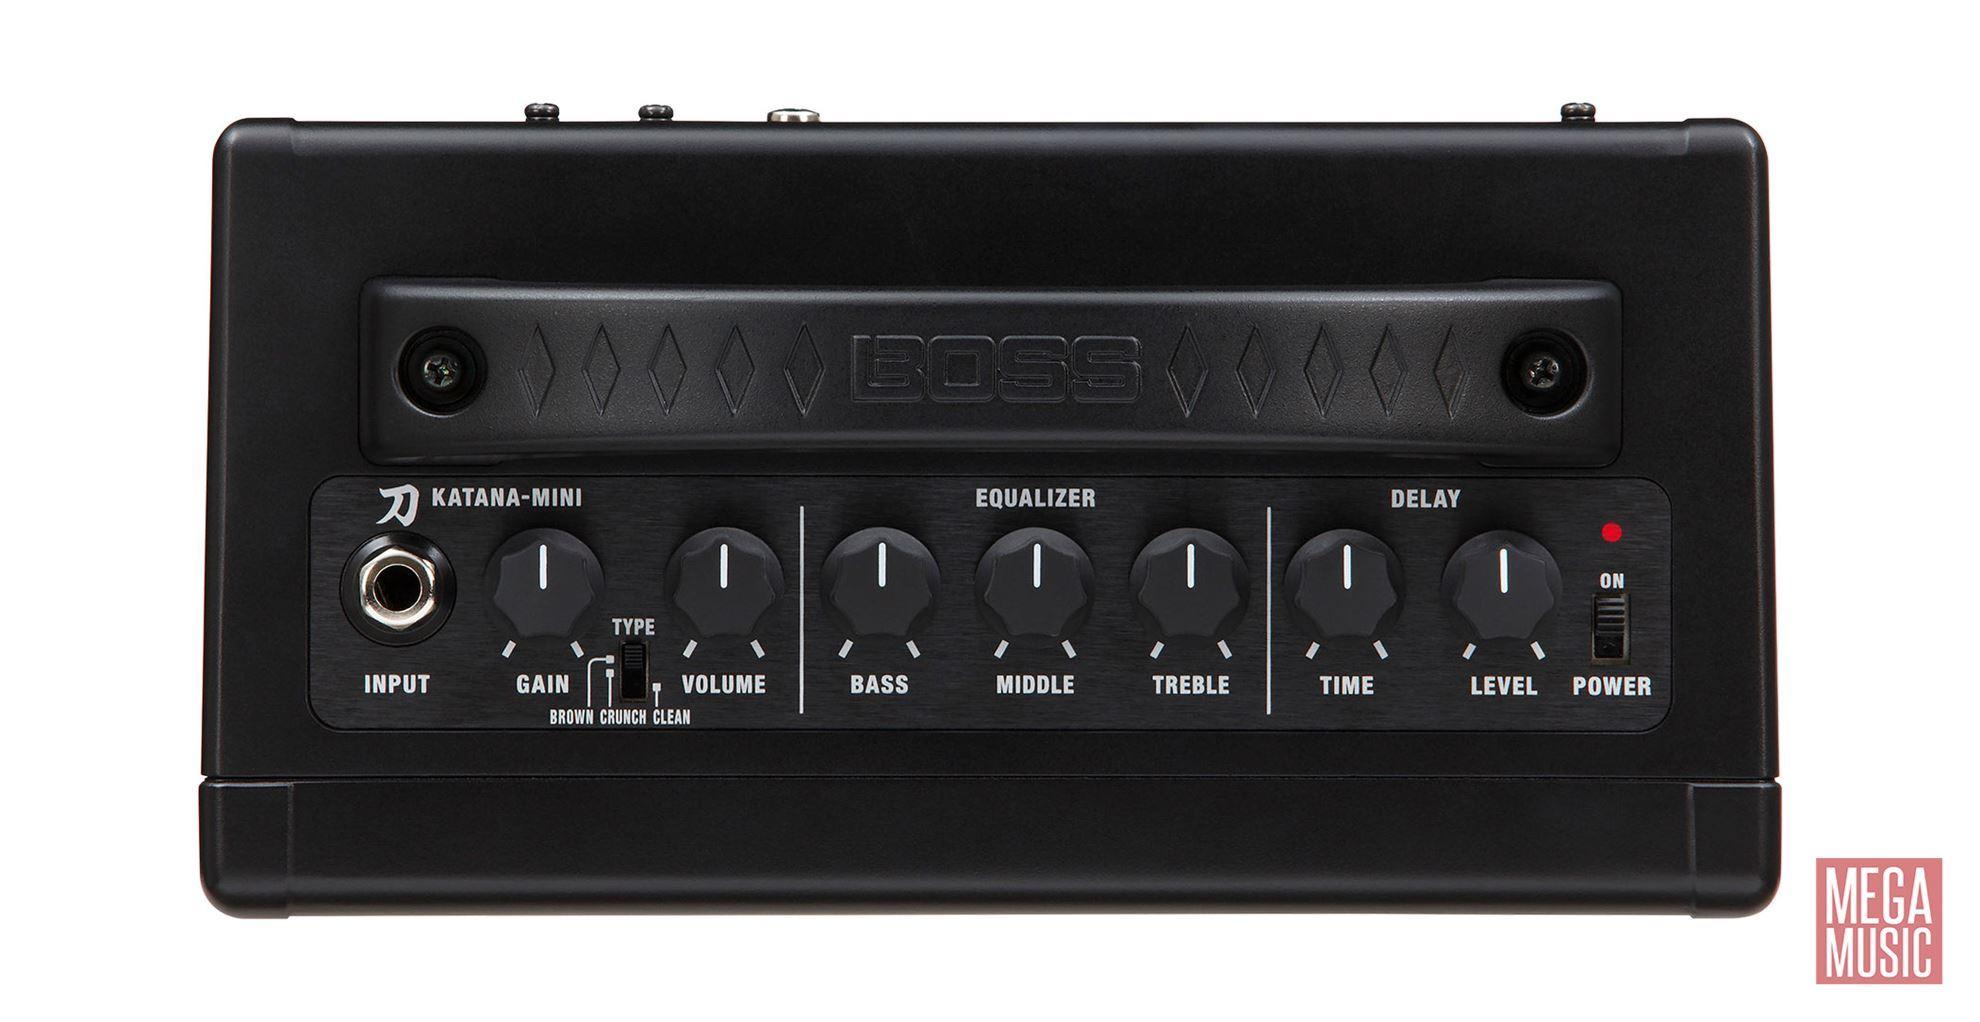 BOSS Katana-Mini Guitar Amplifier - top view